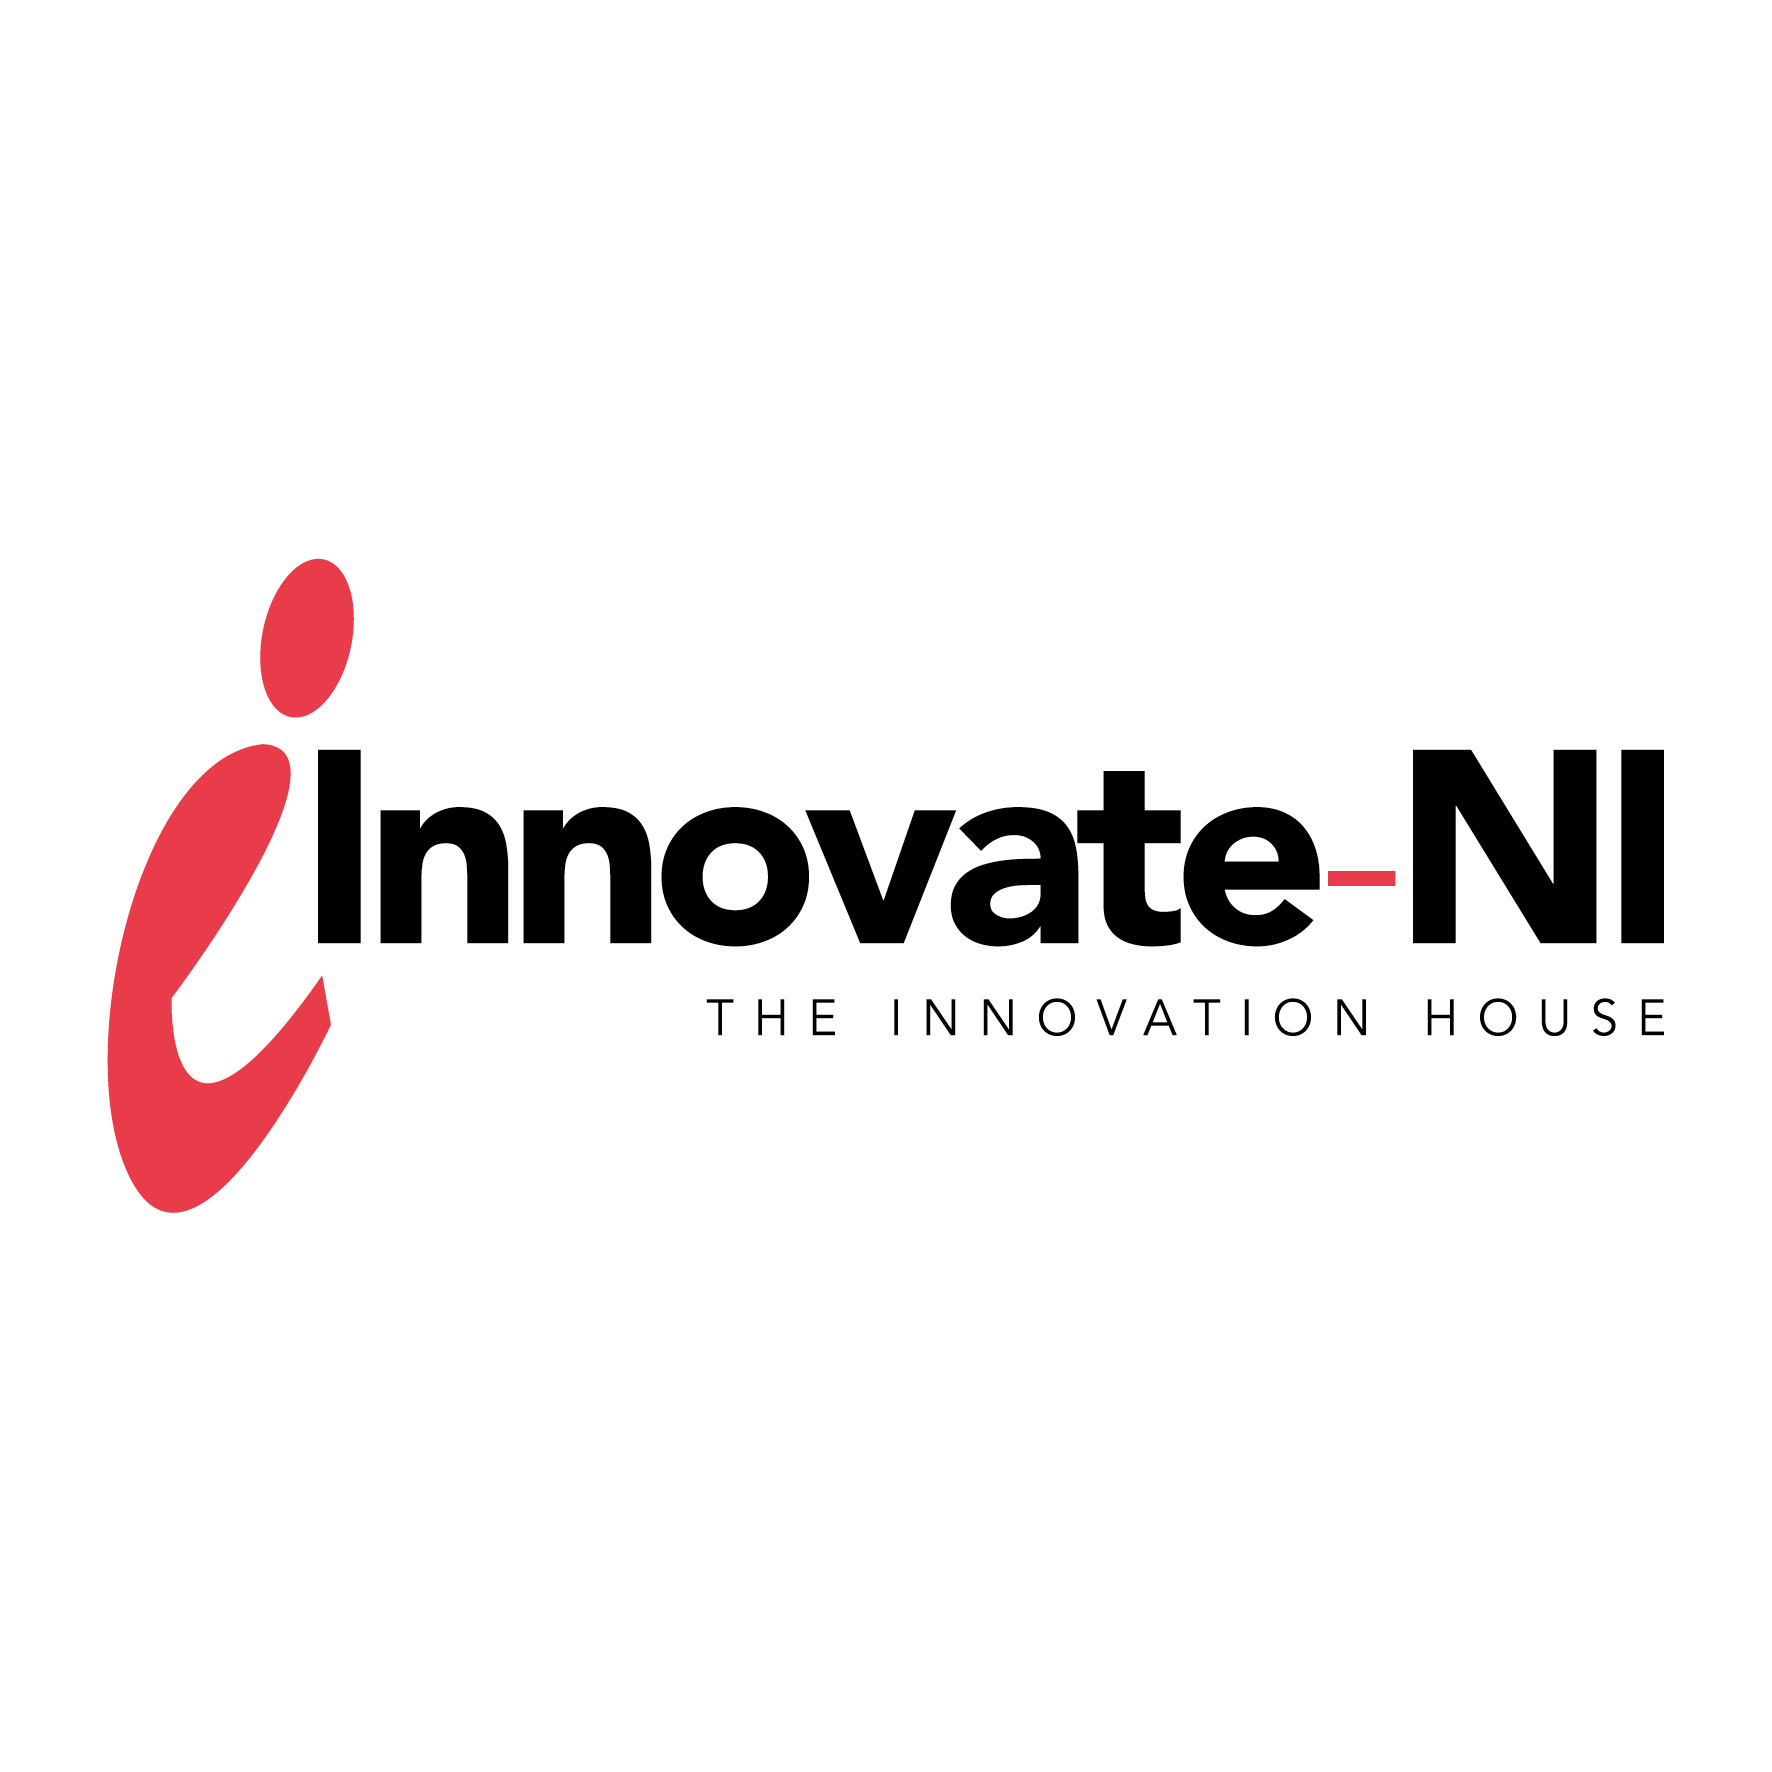 Innovate-NI